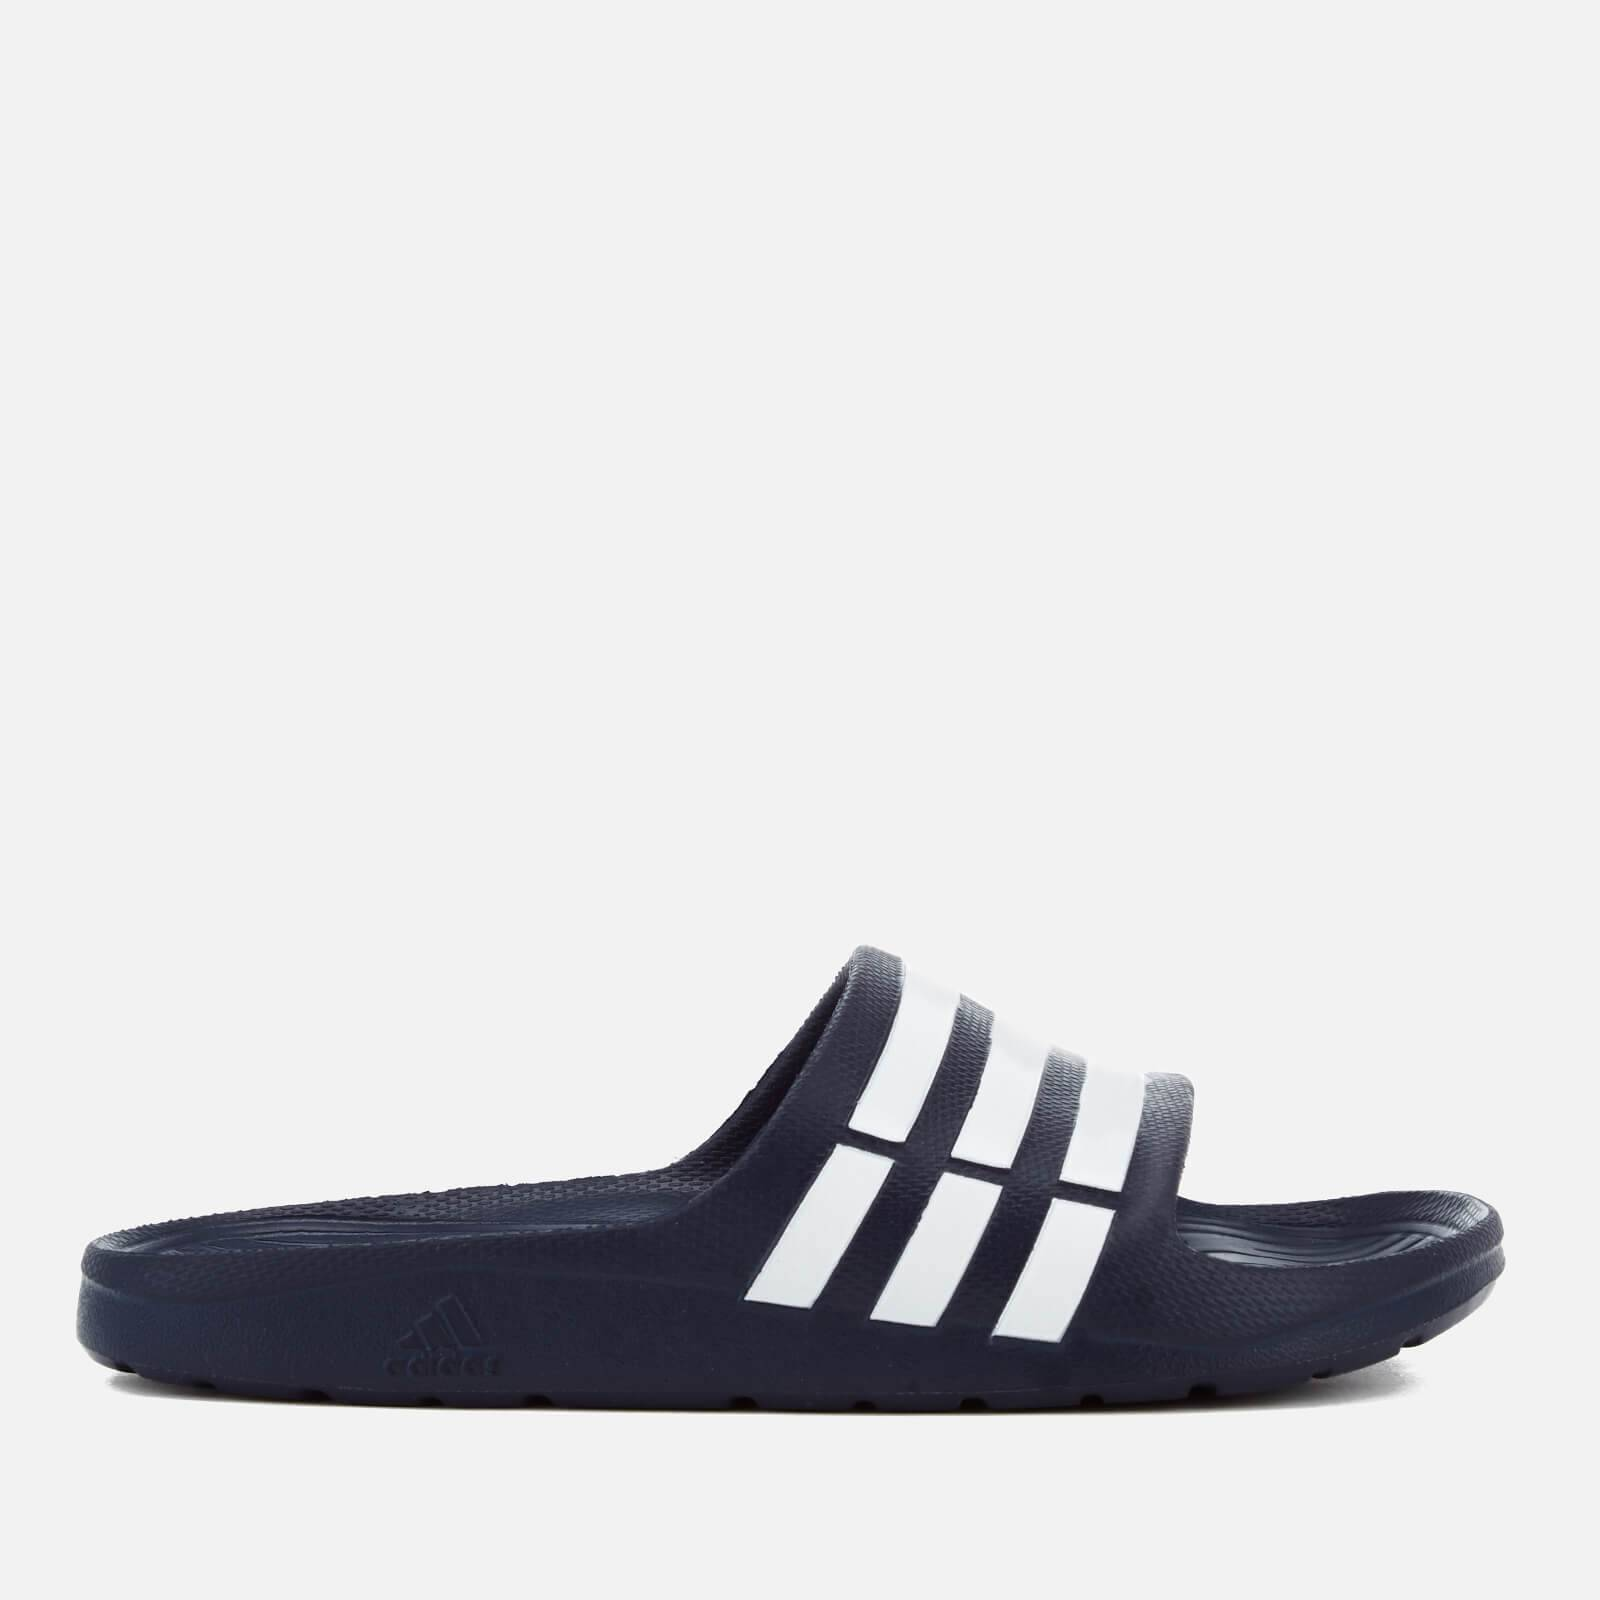 adidas Duramo Slide Sandals - Dark Blue - UK 8